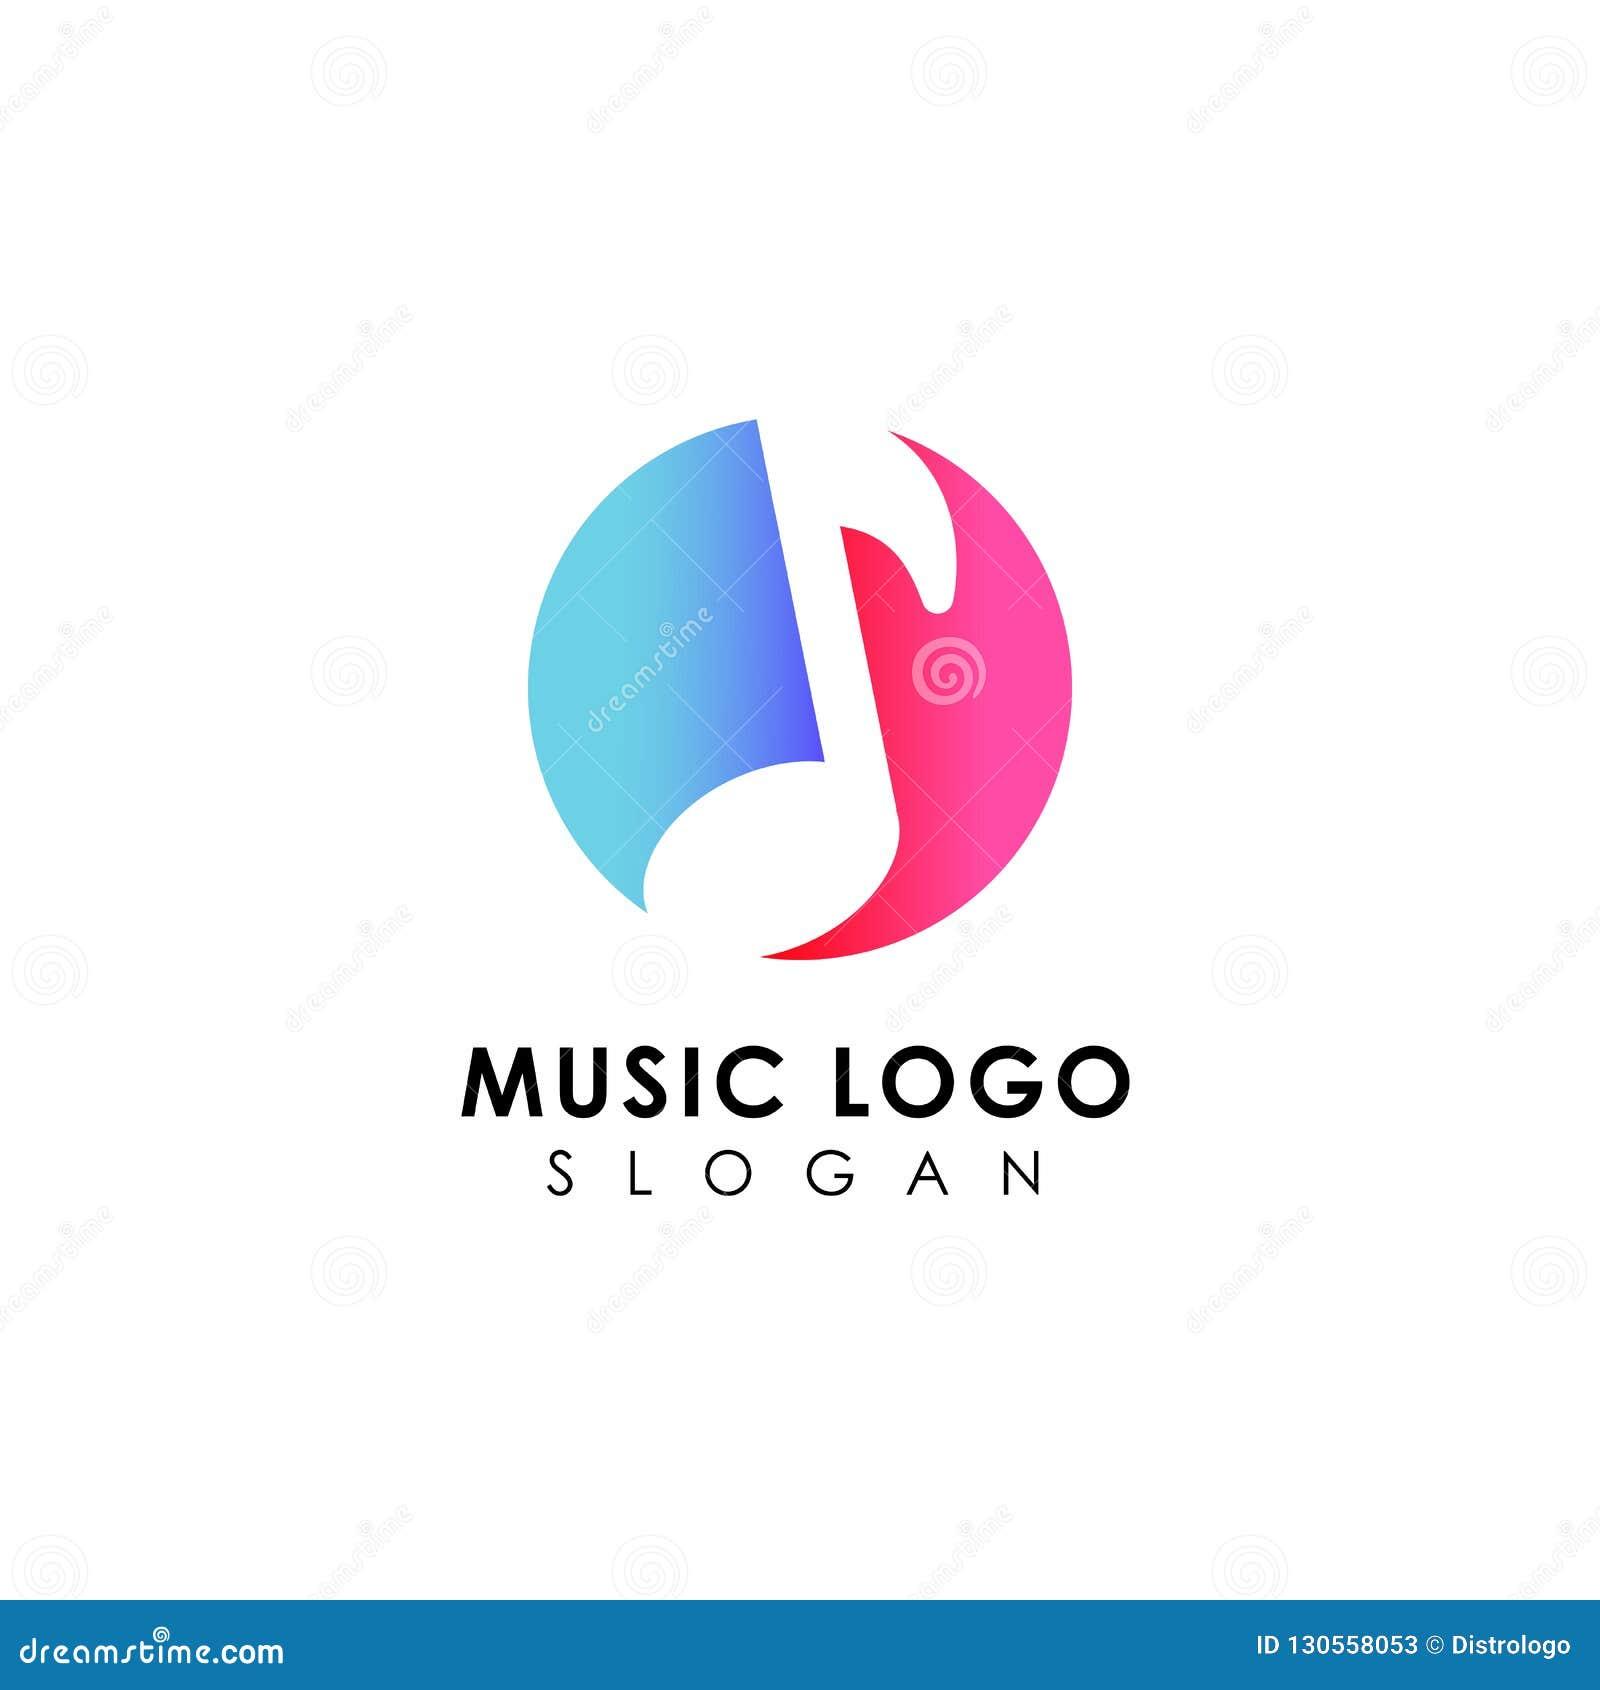 music logo design. flat music note symbol designs